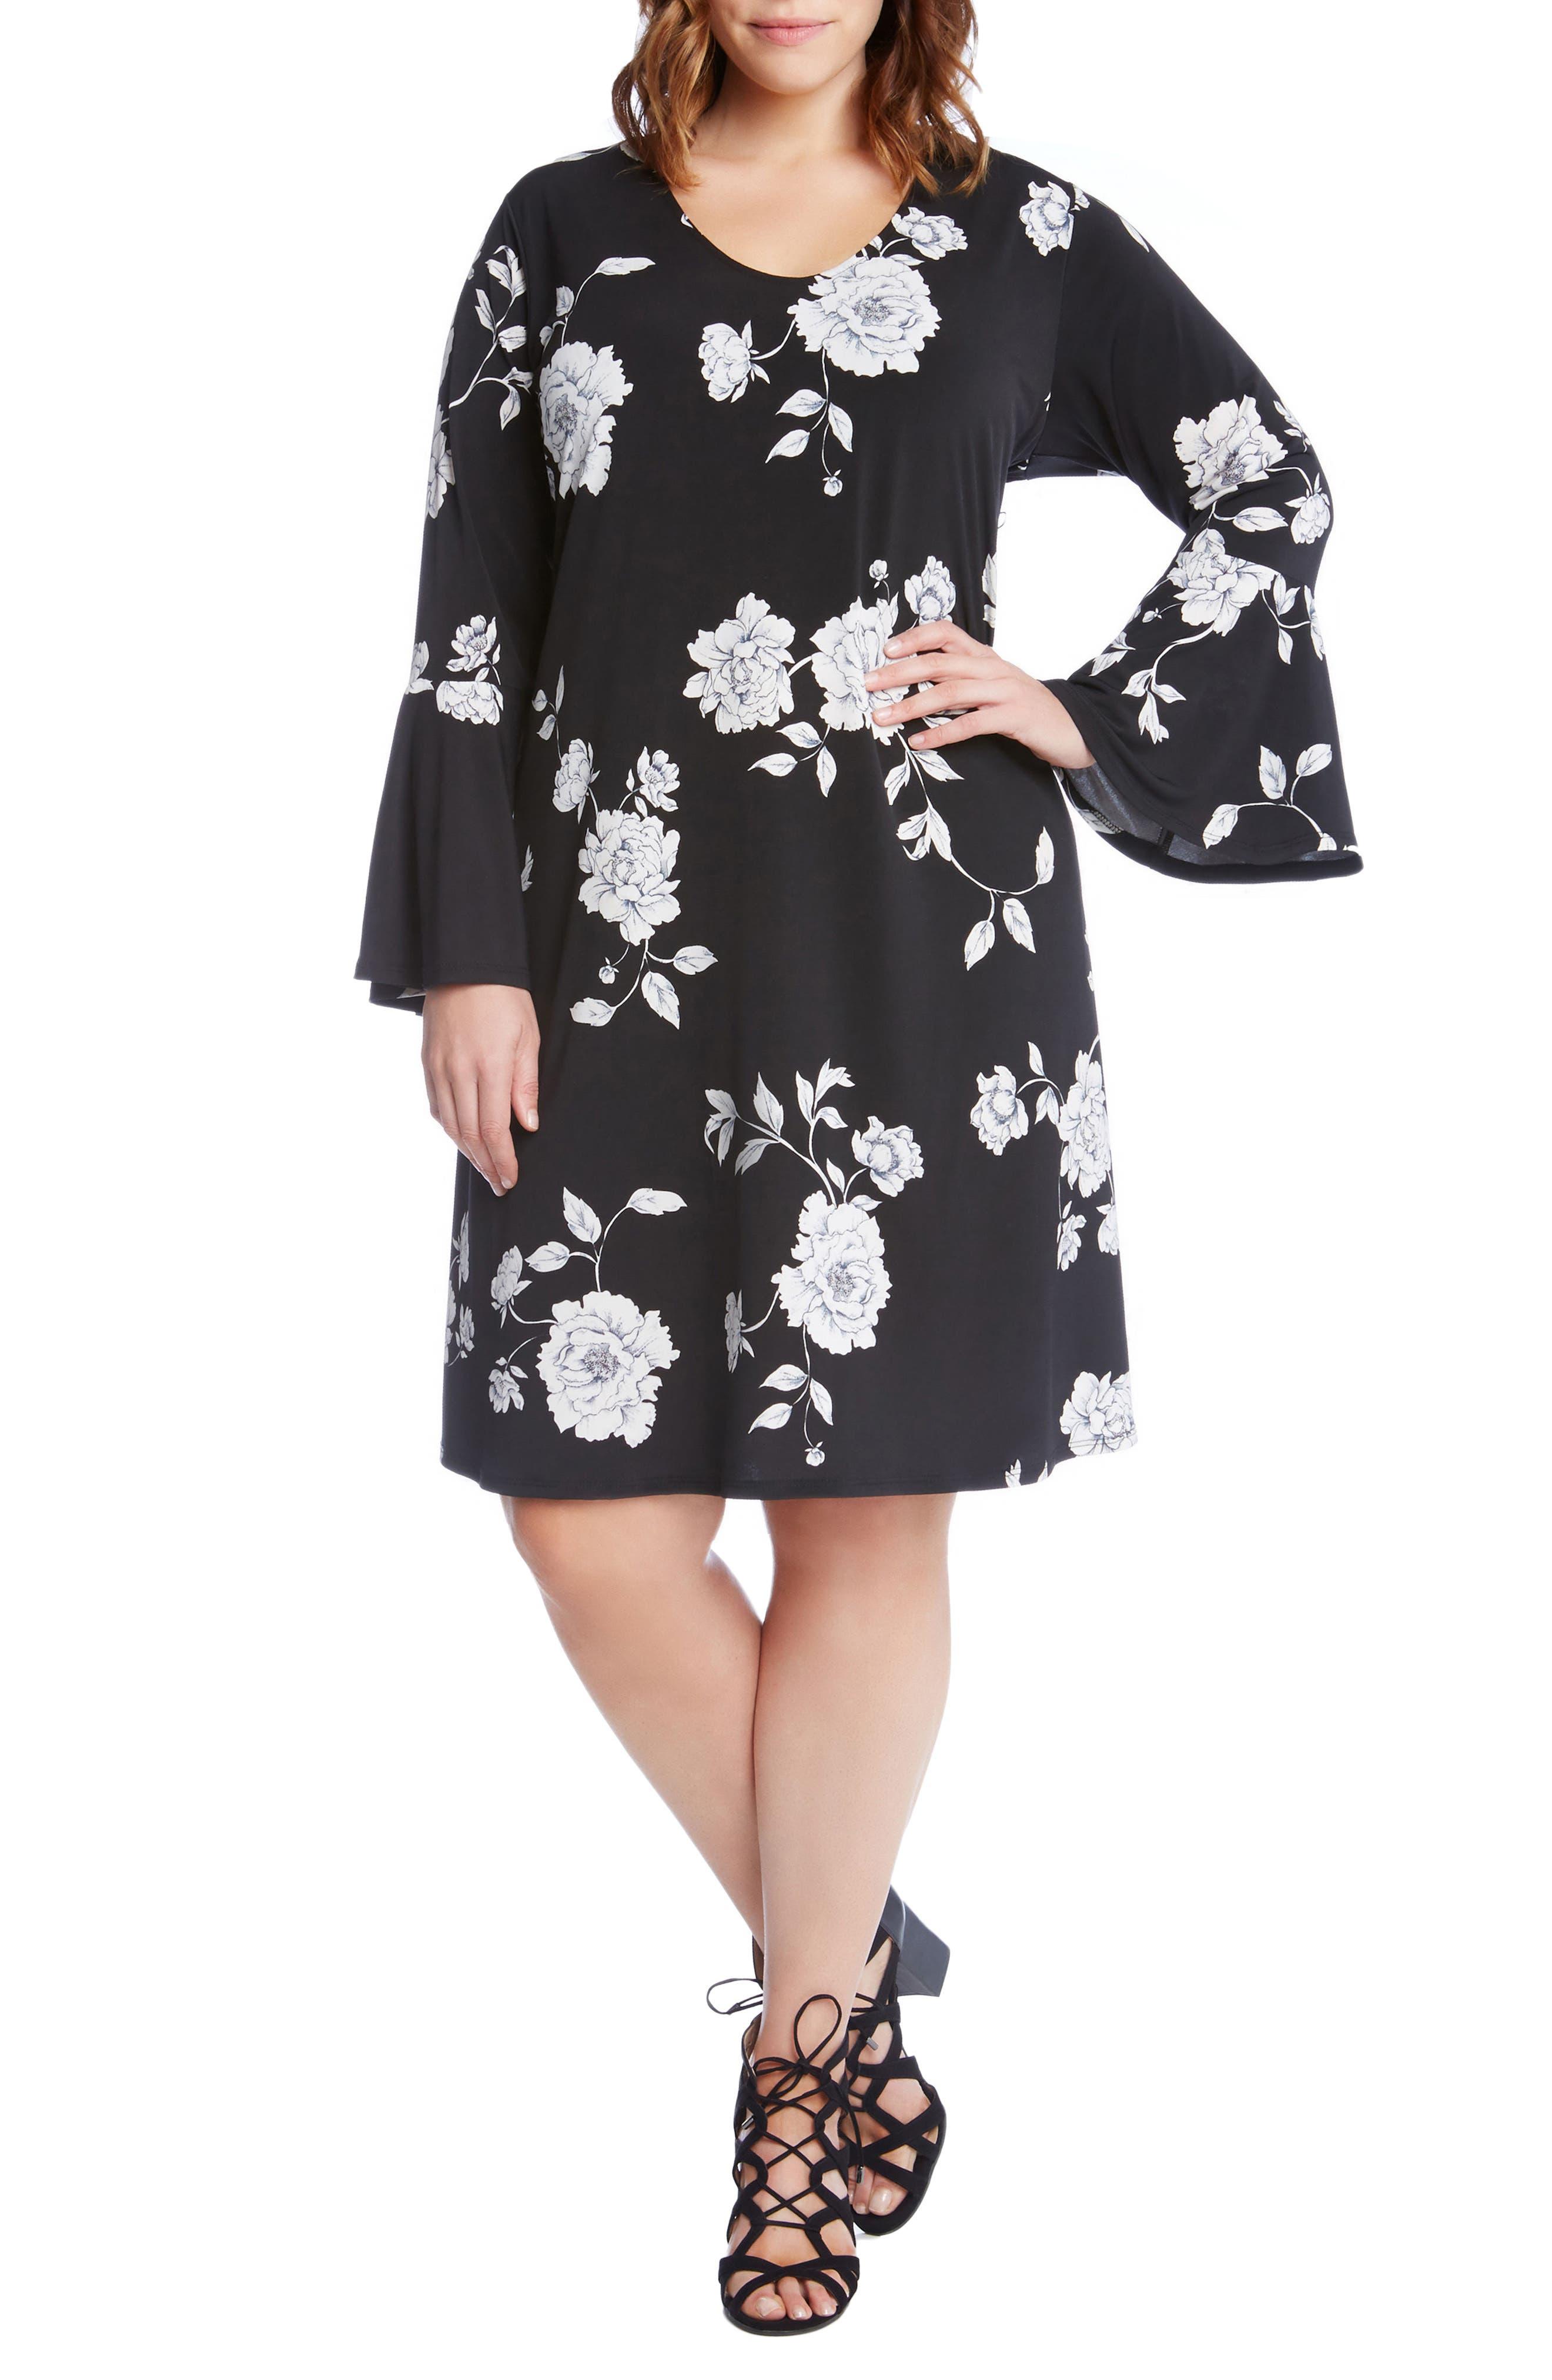 Alternate Image 1 Selected - Karen Kane Taylor Flare Sleeve Swing Dress (Plus Size)